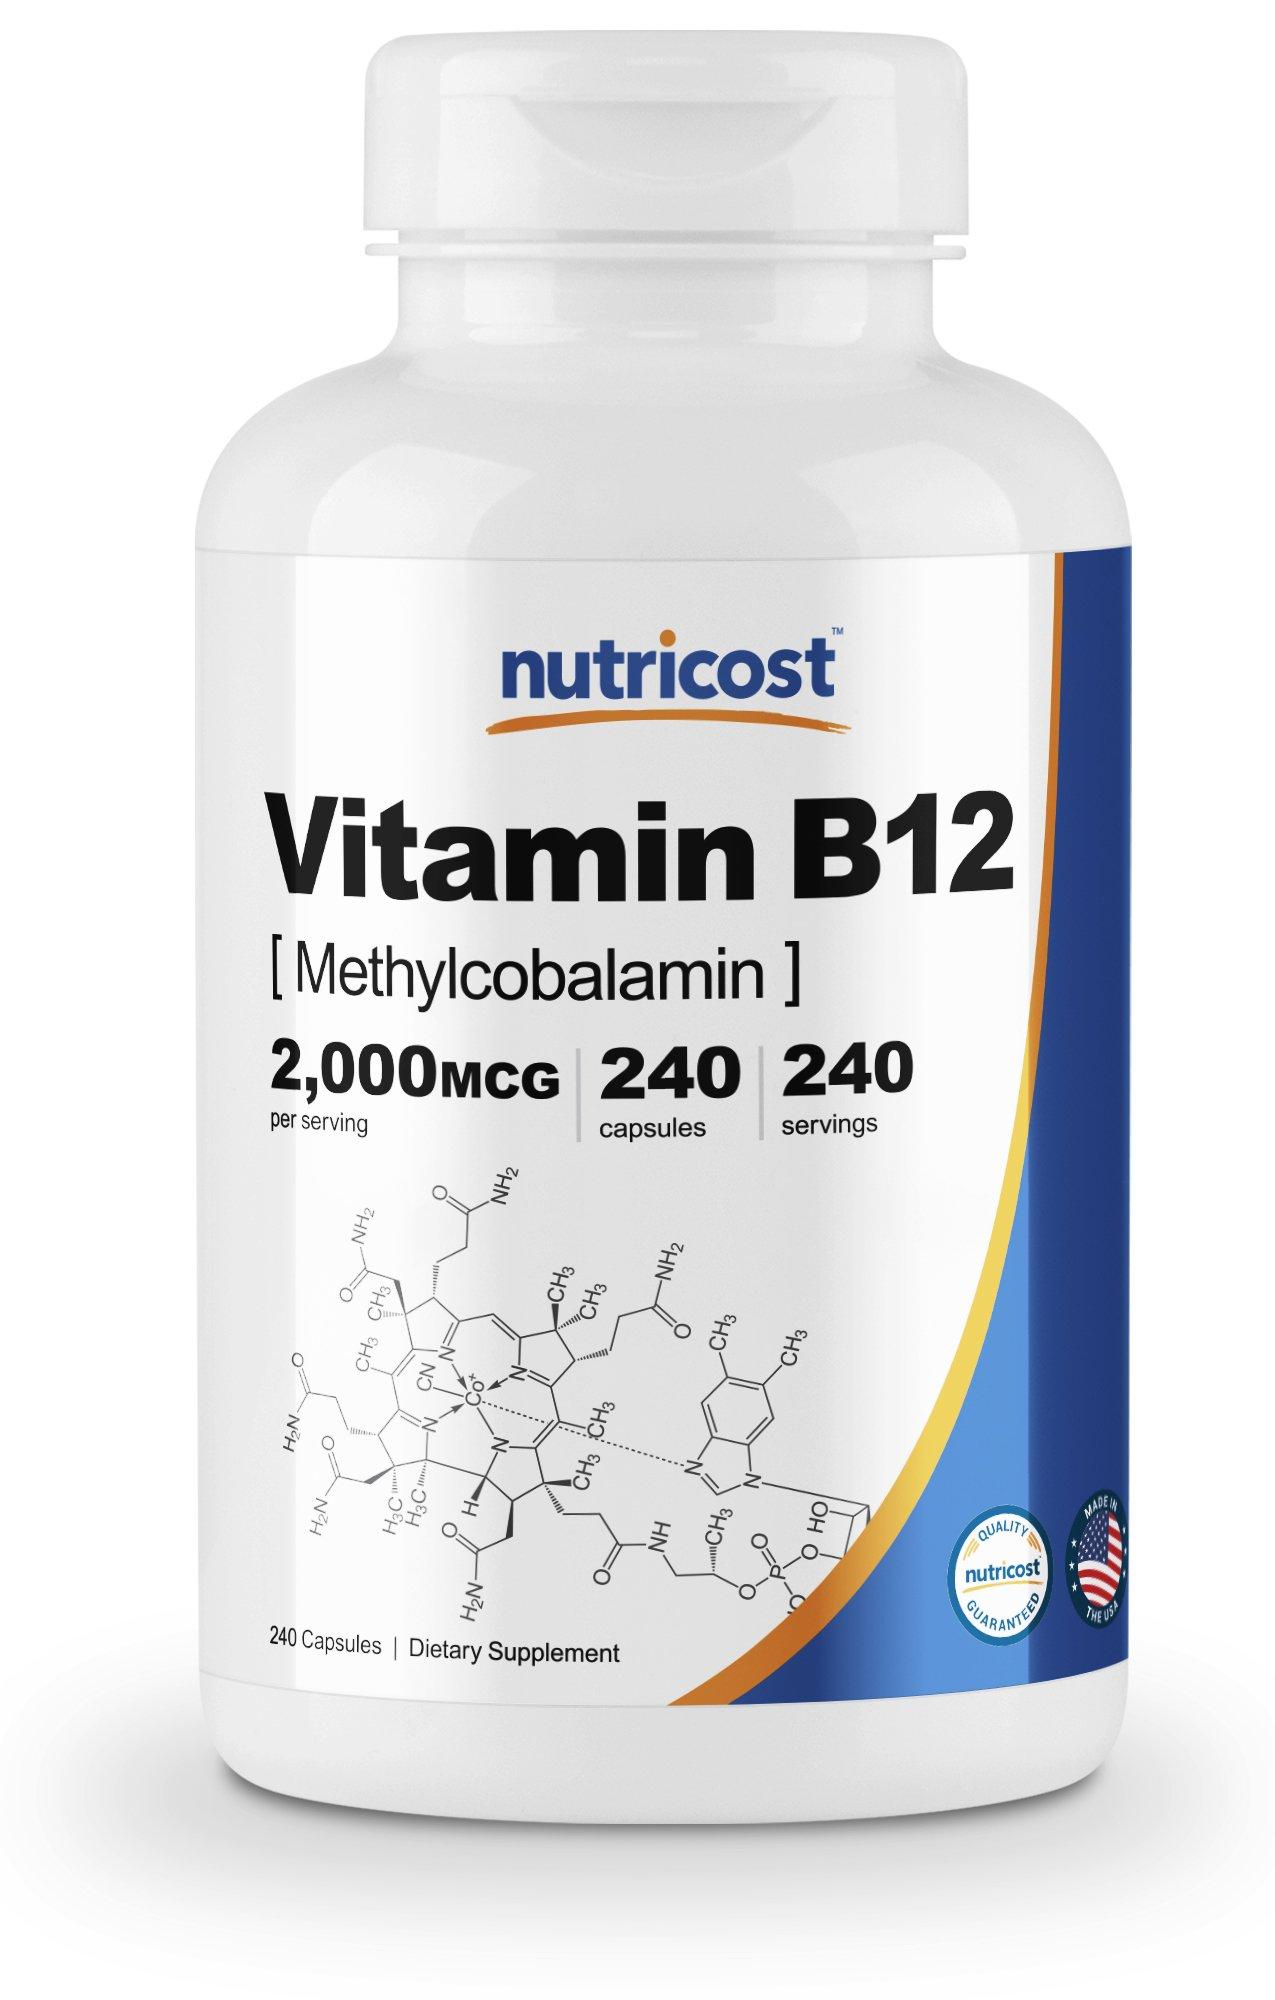 Nutricost Vitamin B12 (Methylcobalamin) 2000mcg, 240 Capsules - Non-GMO, Gluten Free B12 Supplement